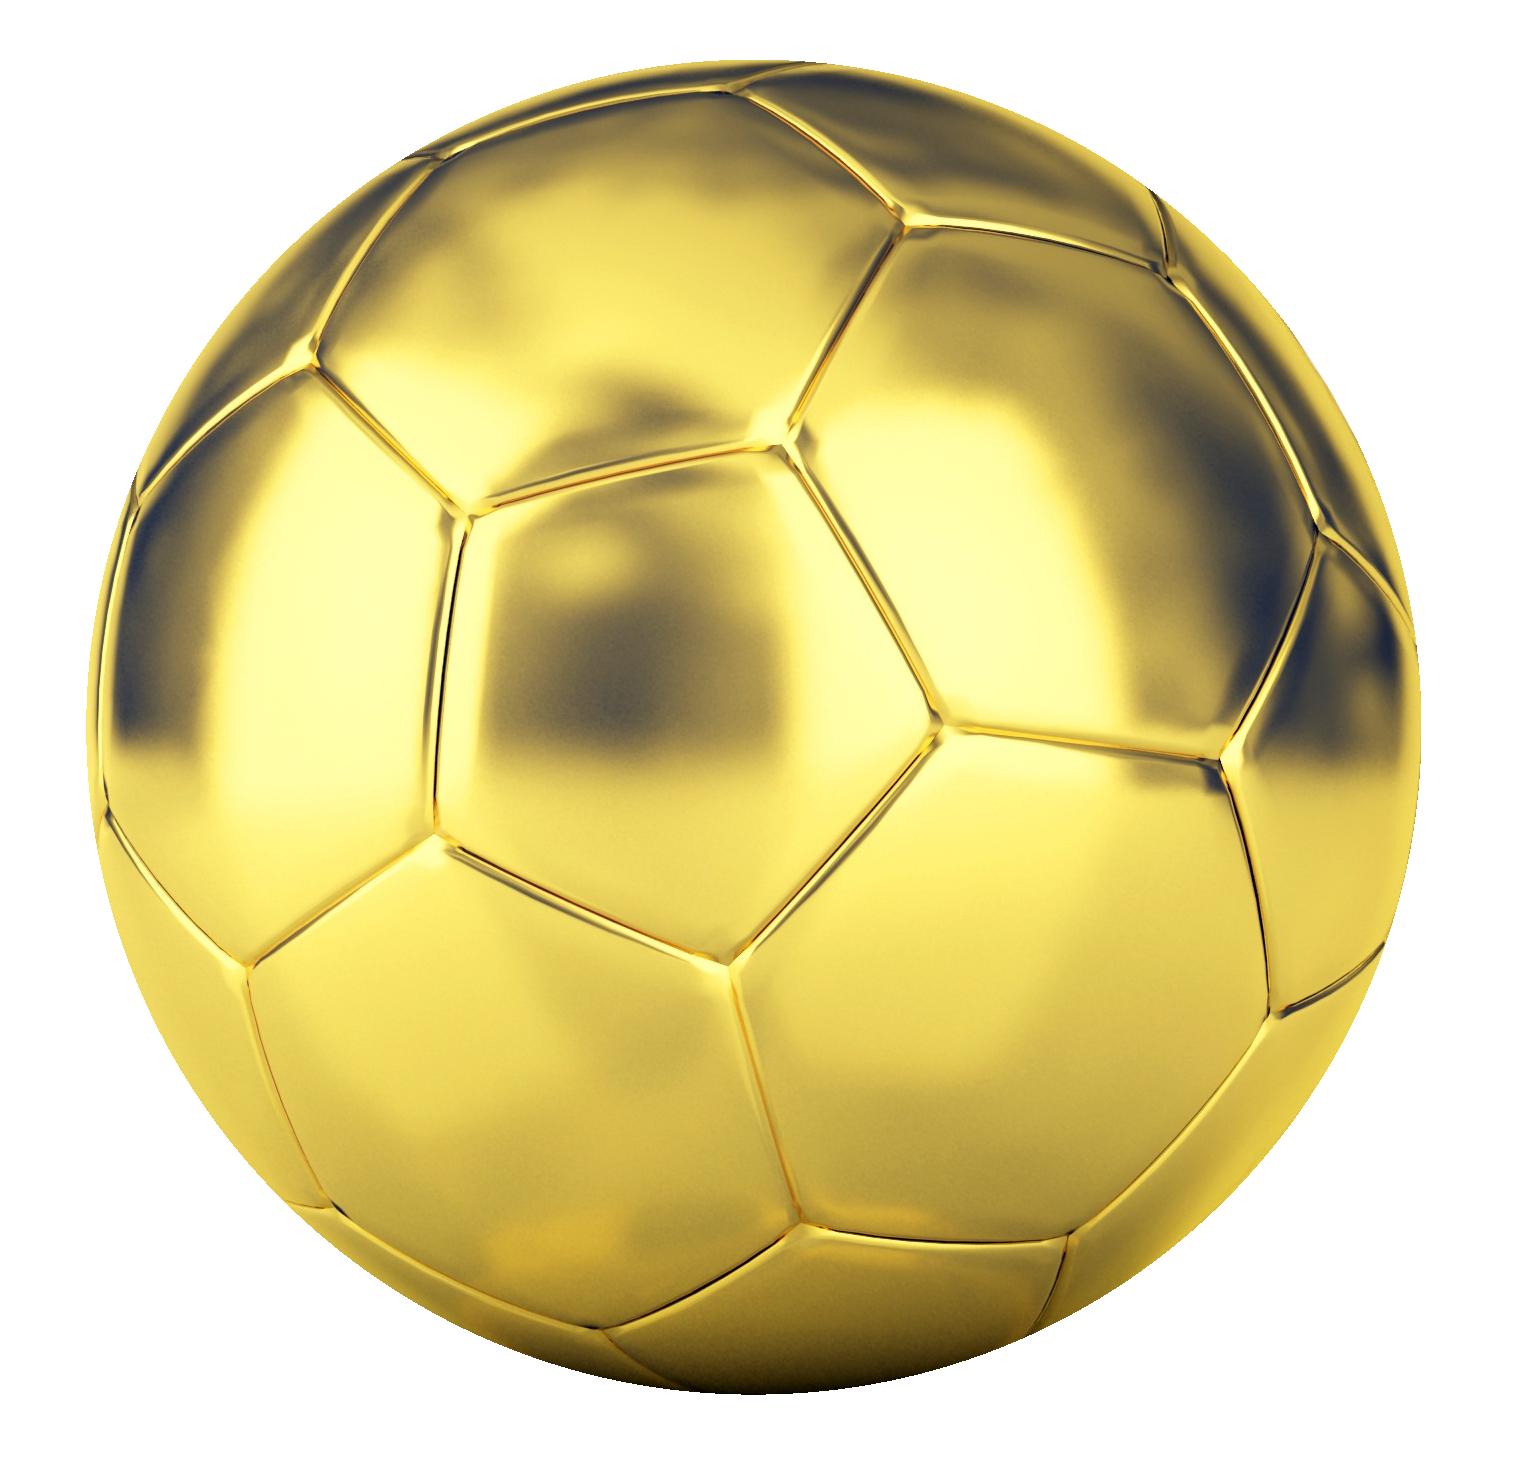 Golden Football Png Transparent Image - Football, Transparent background PNG HD thumbnail